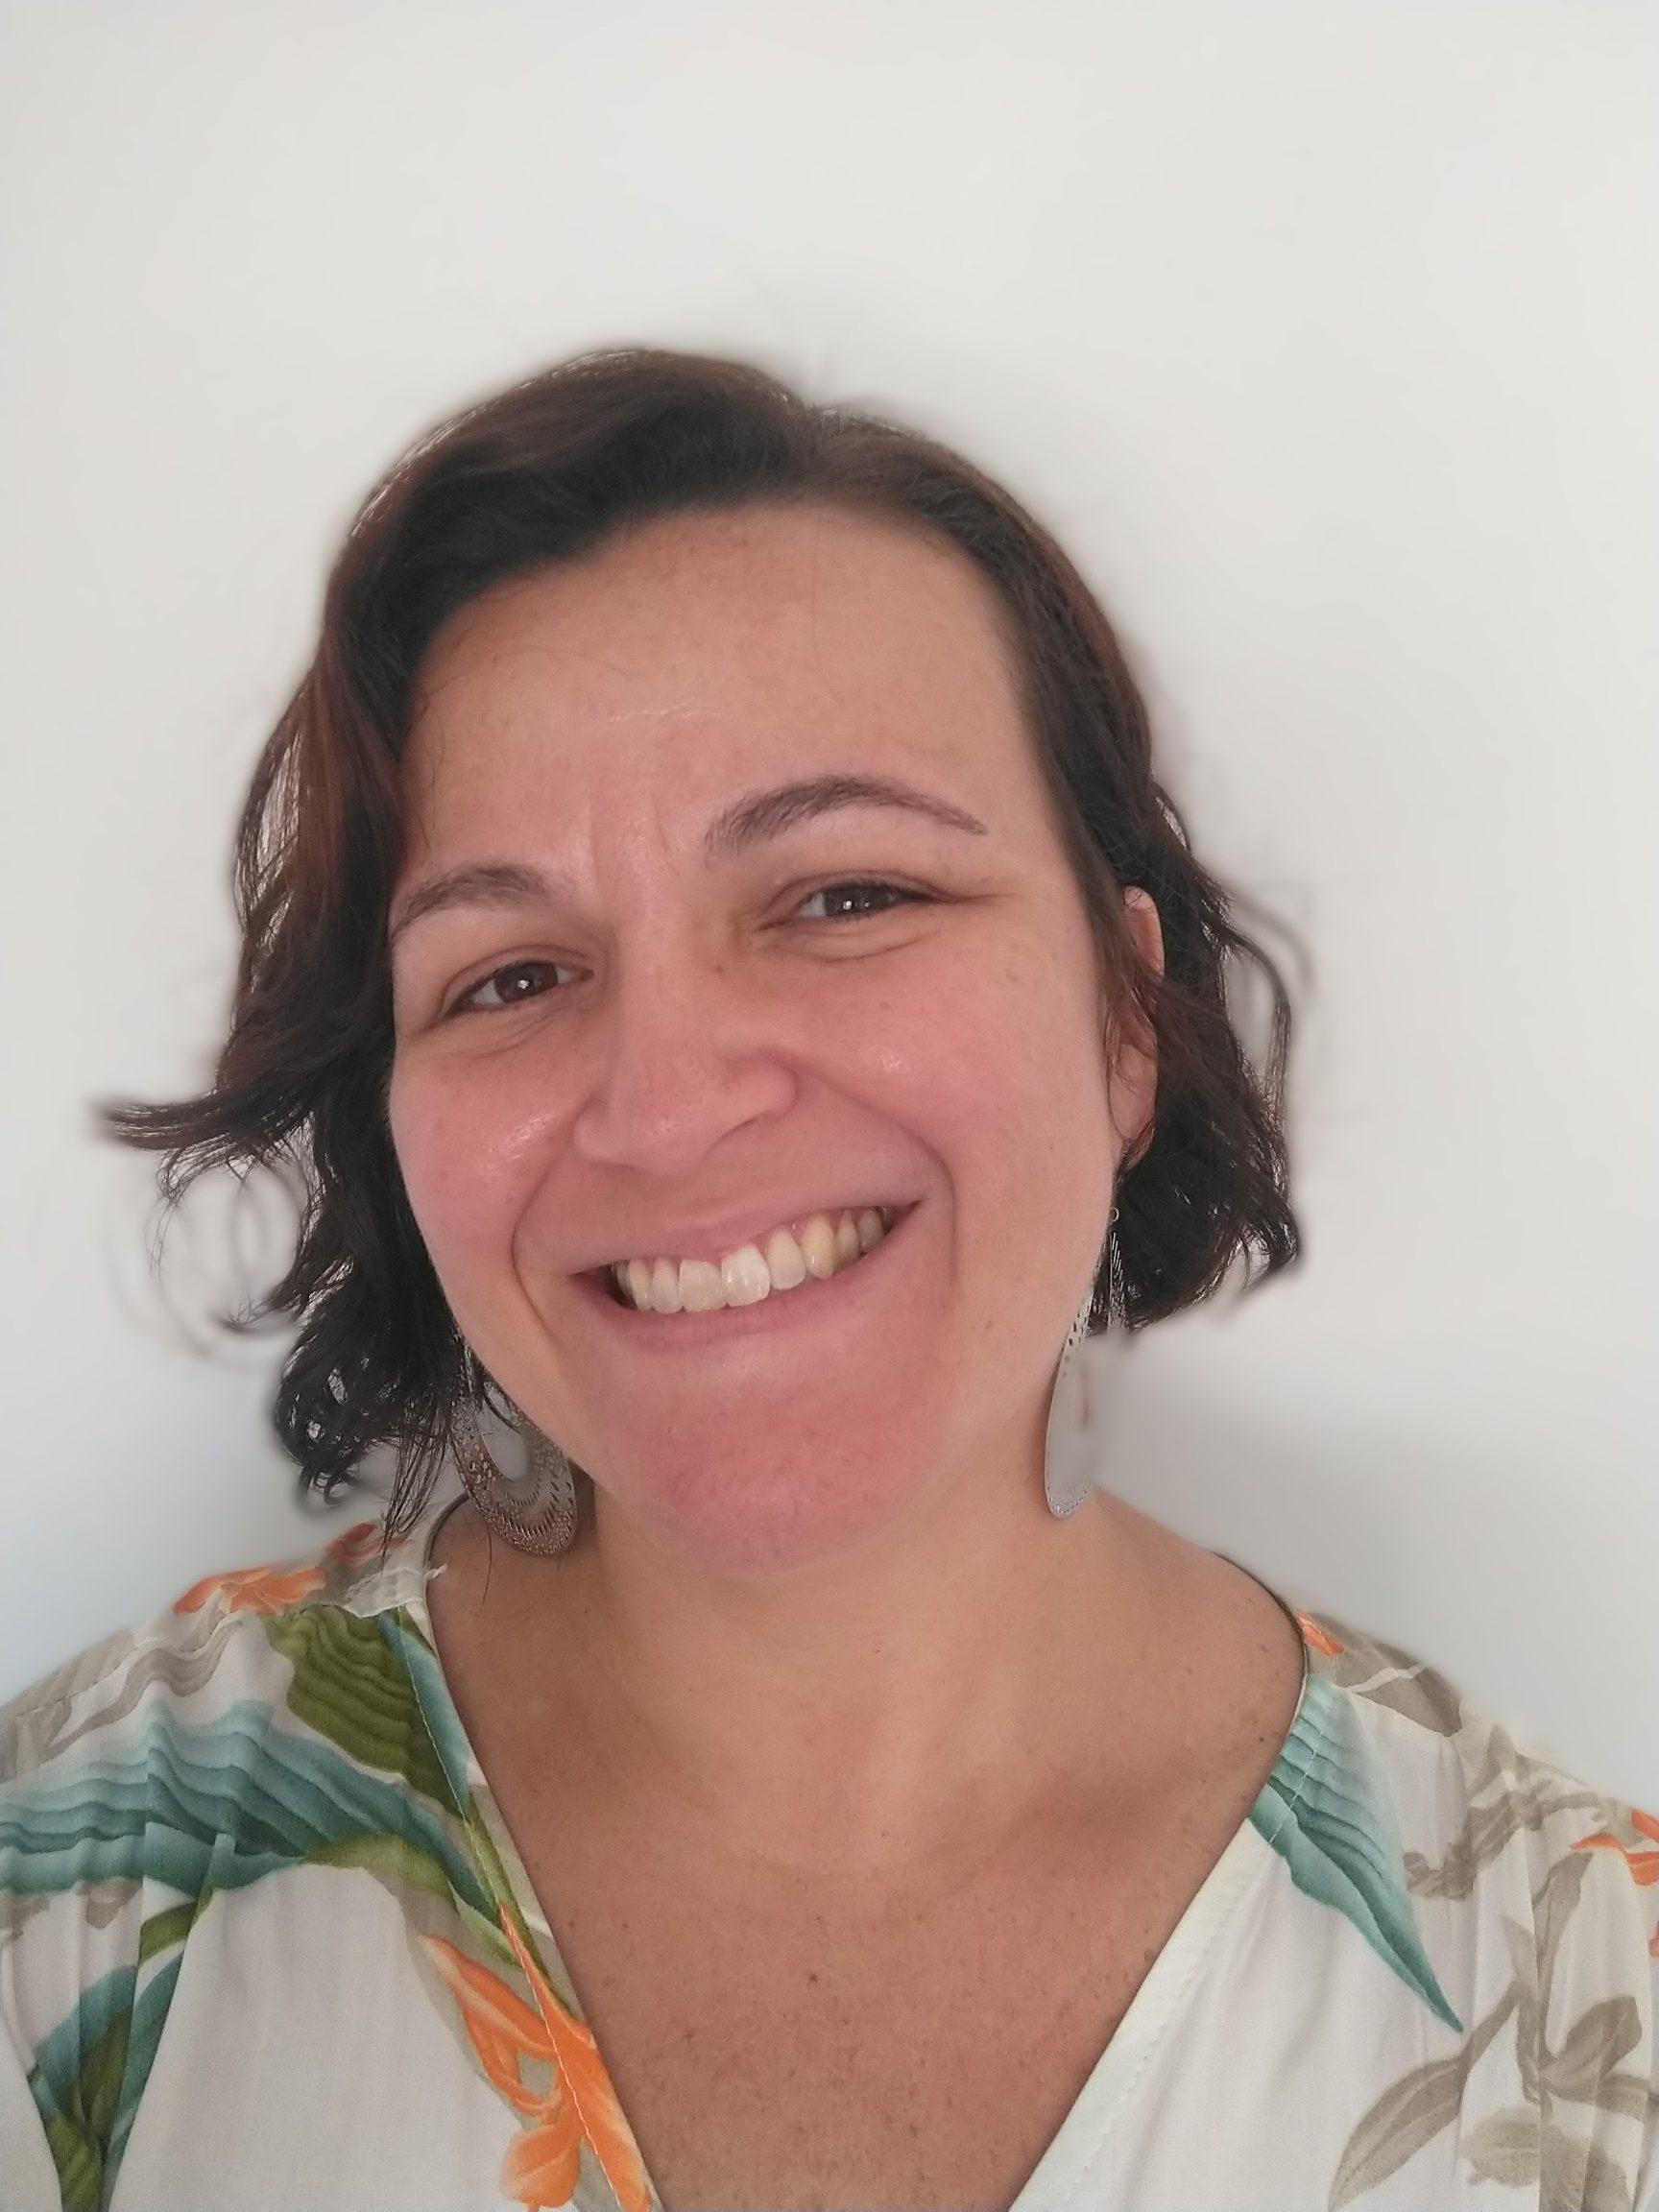 Amanda Maria Moreira Villela de Oliveira